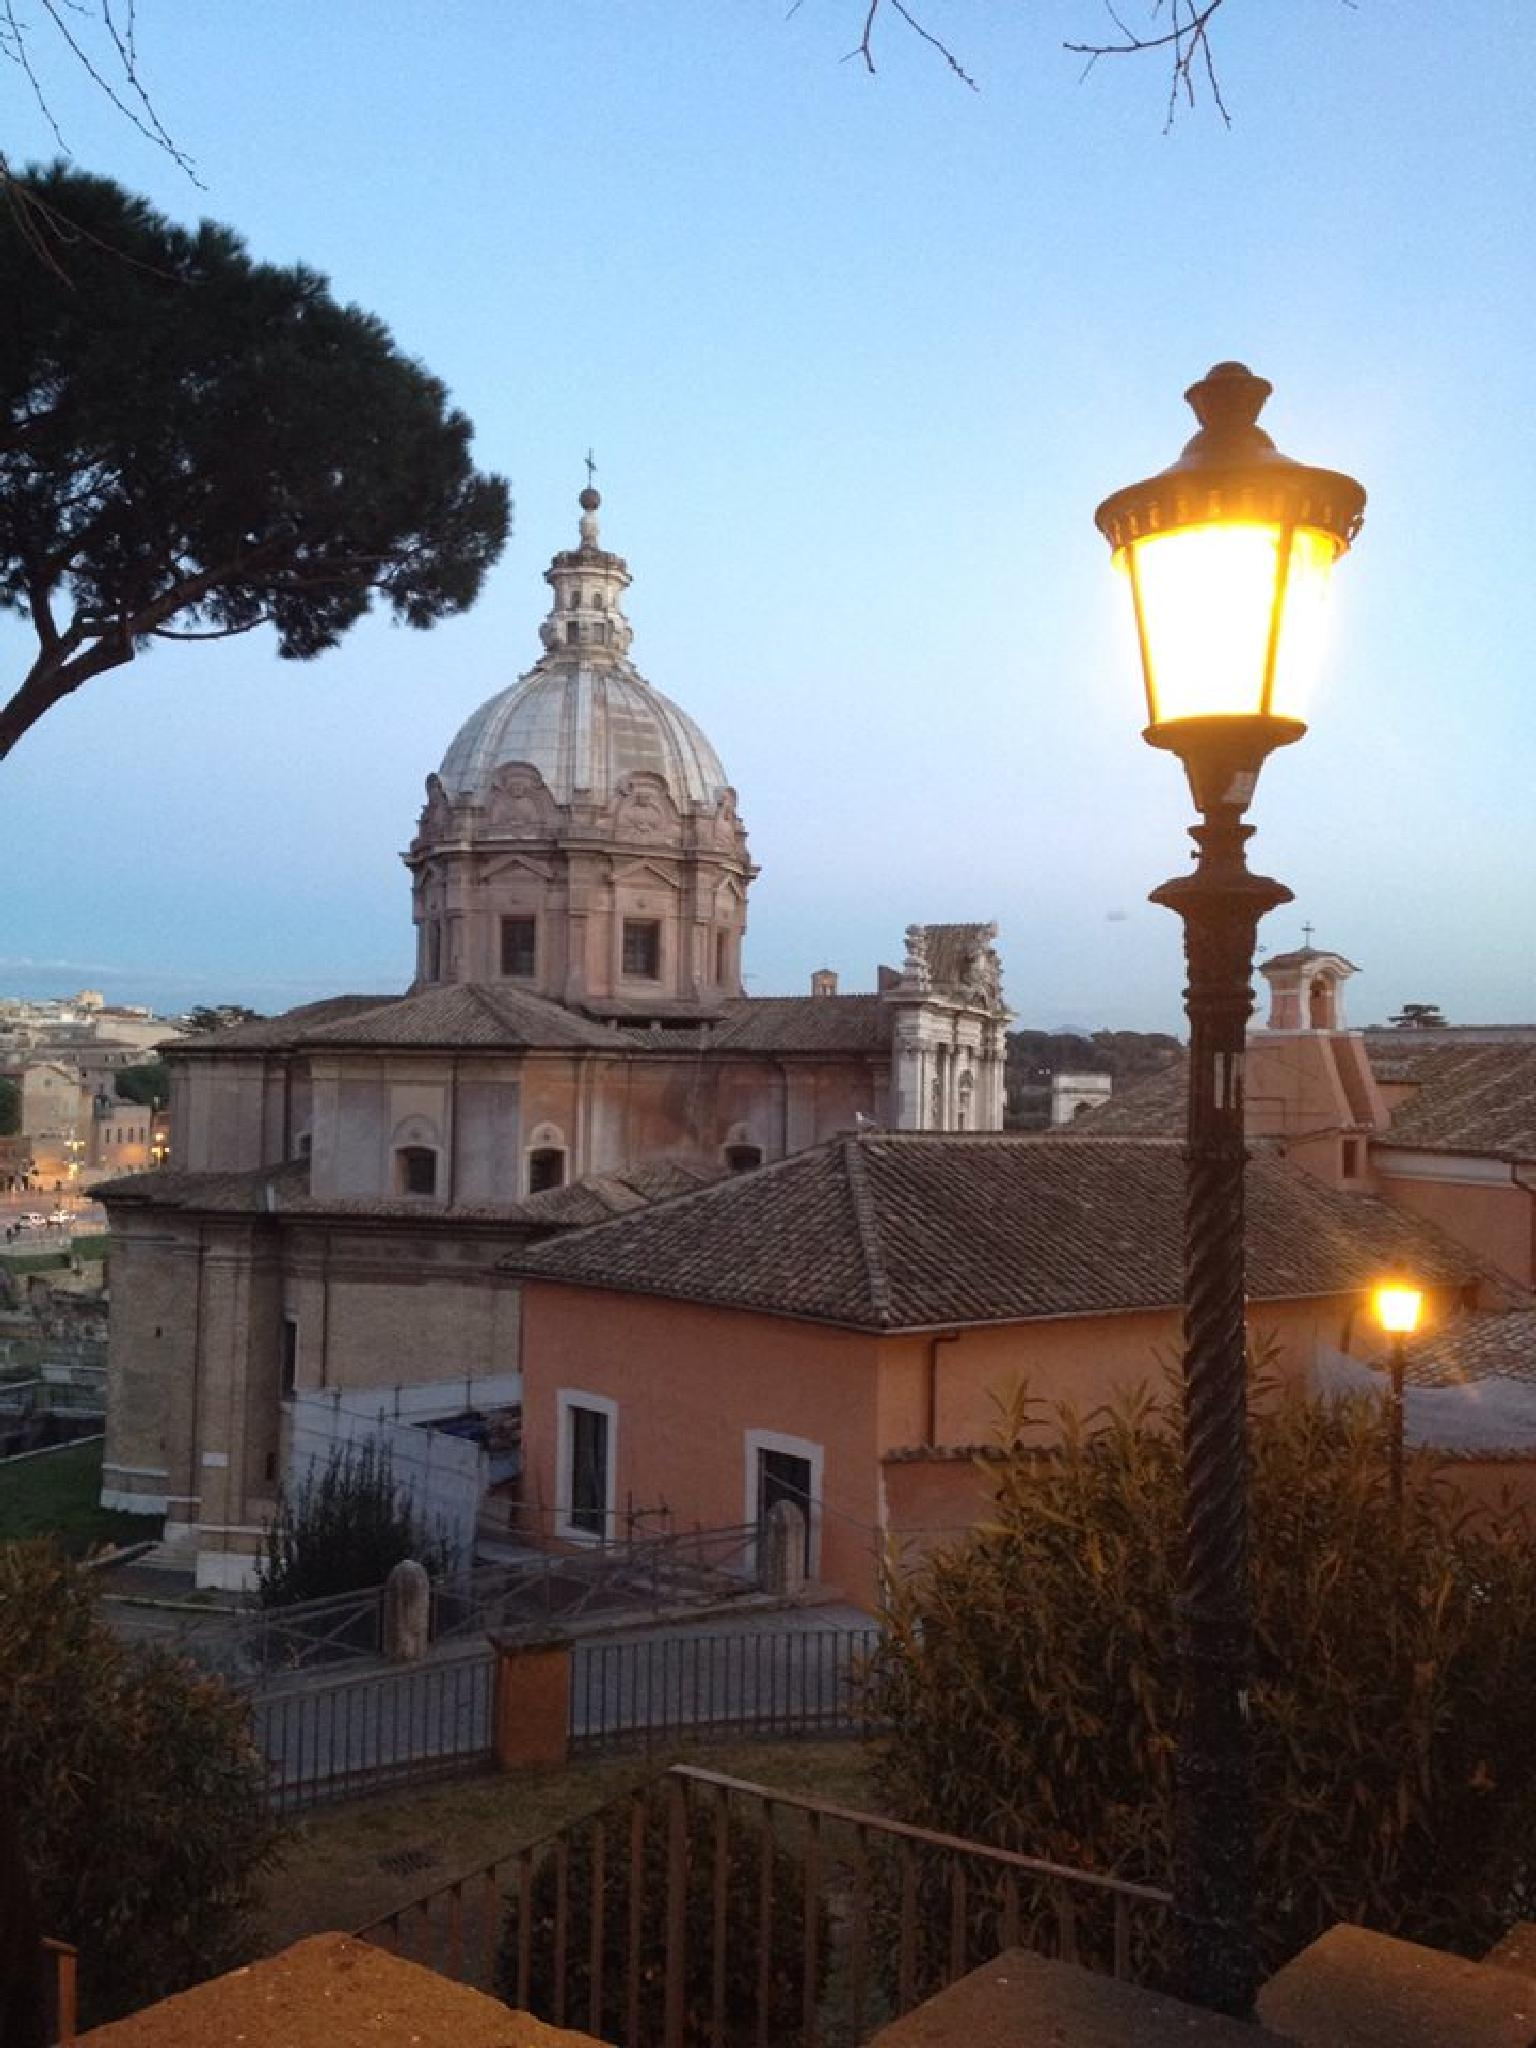 Roman Forum, Rome by grossiroma